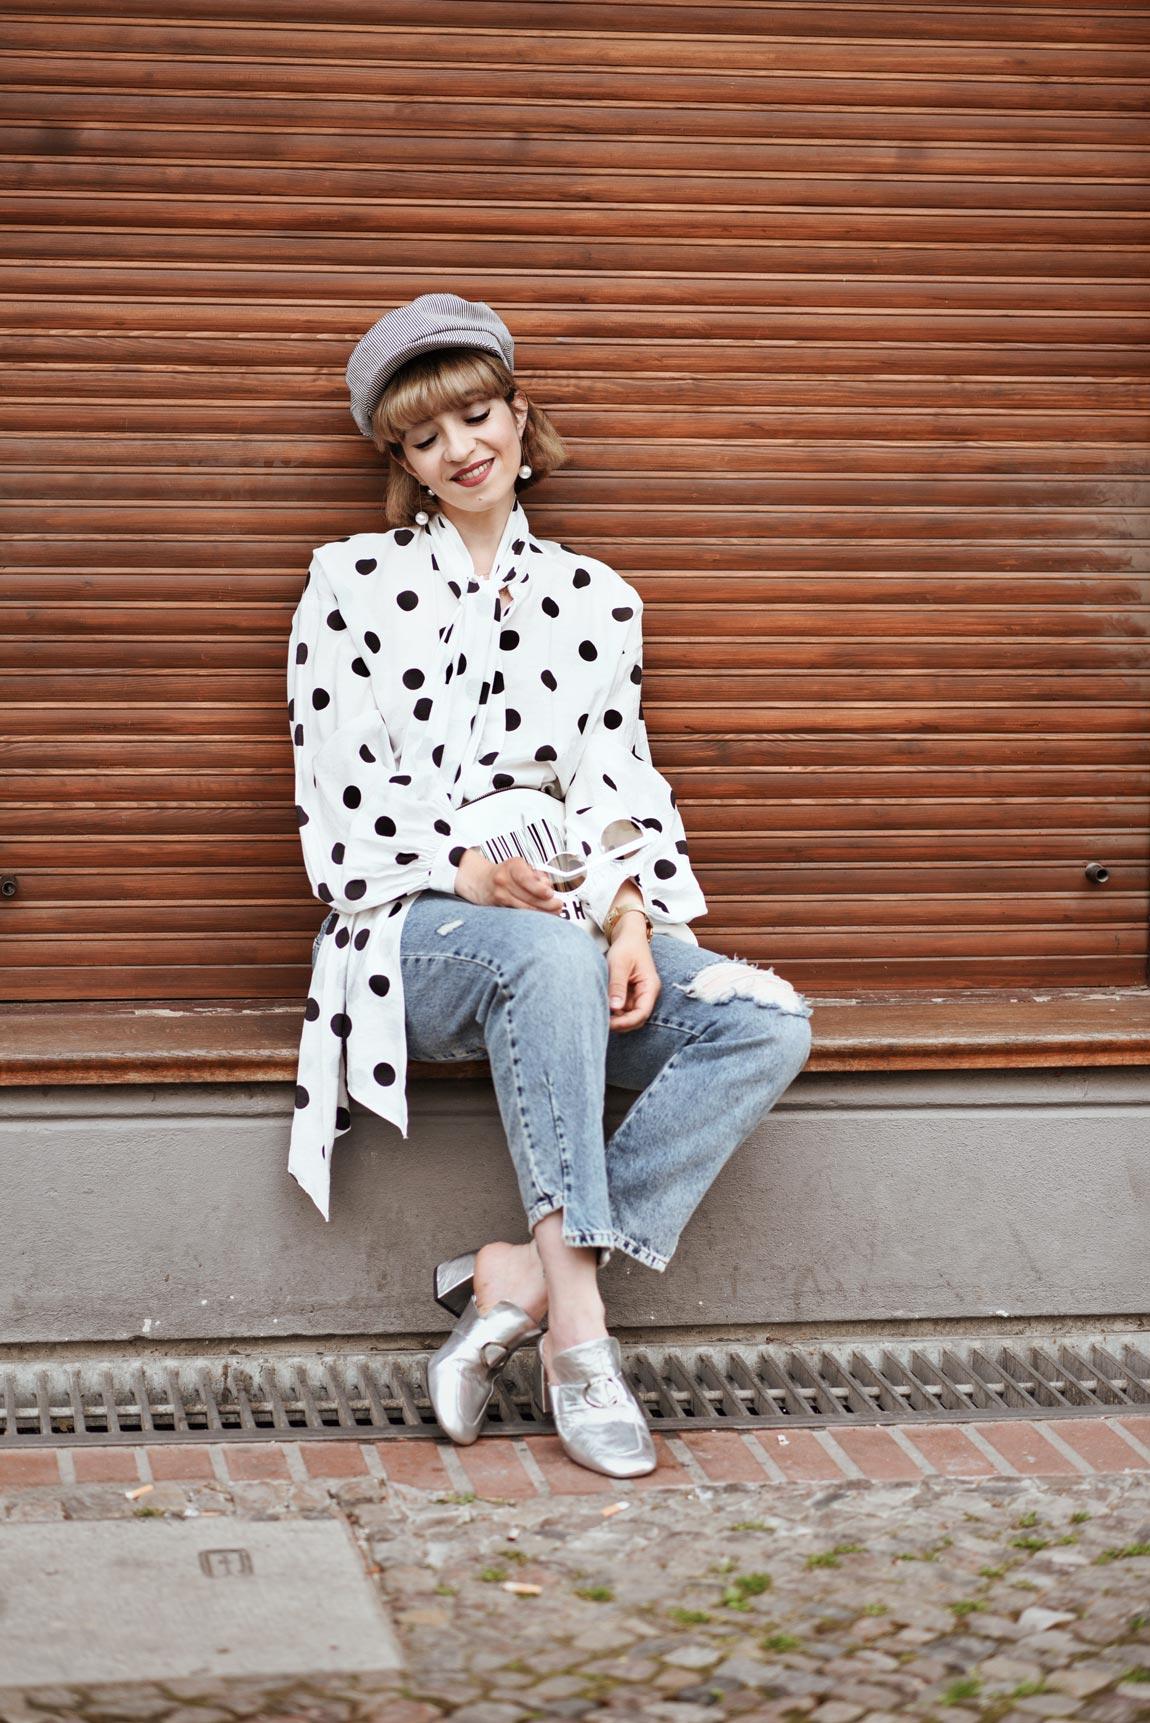 punkte, bluse, outfit, berlin, blogger, modeblog, fashionblog, streetstyle, sommer, inspiration, jeans, denim, retro, kombi, cute